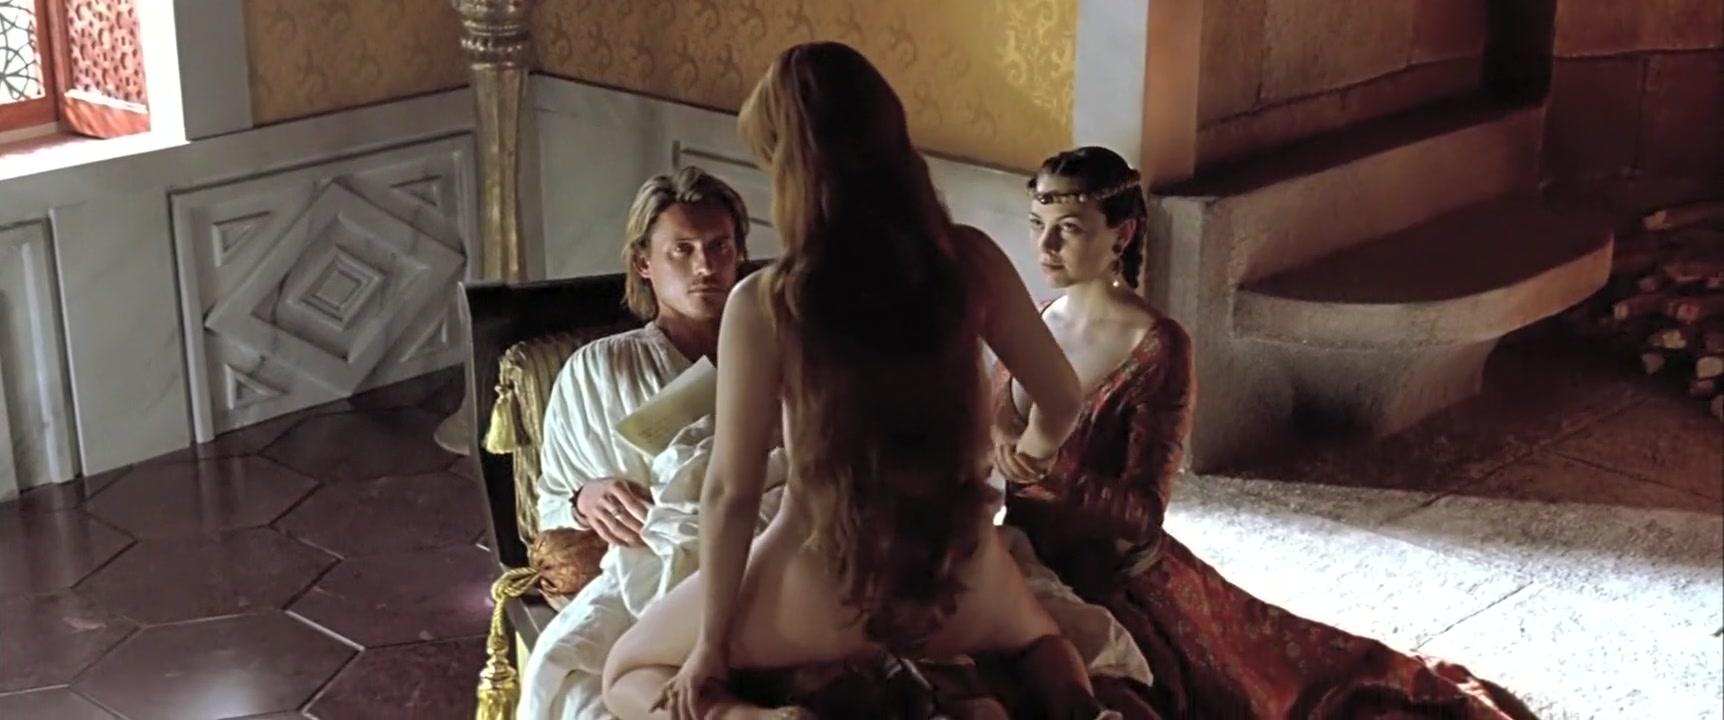 Porn Pics & Movies Eduardo passarelli tirico sexual harassment